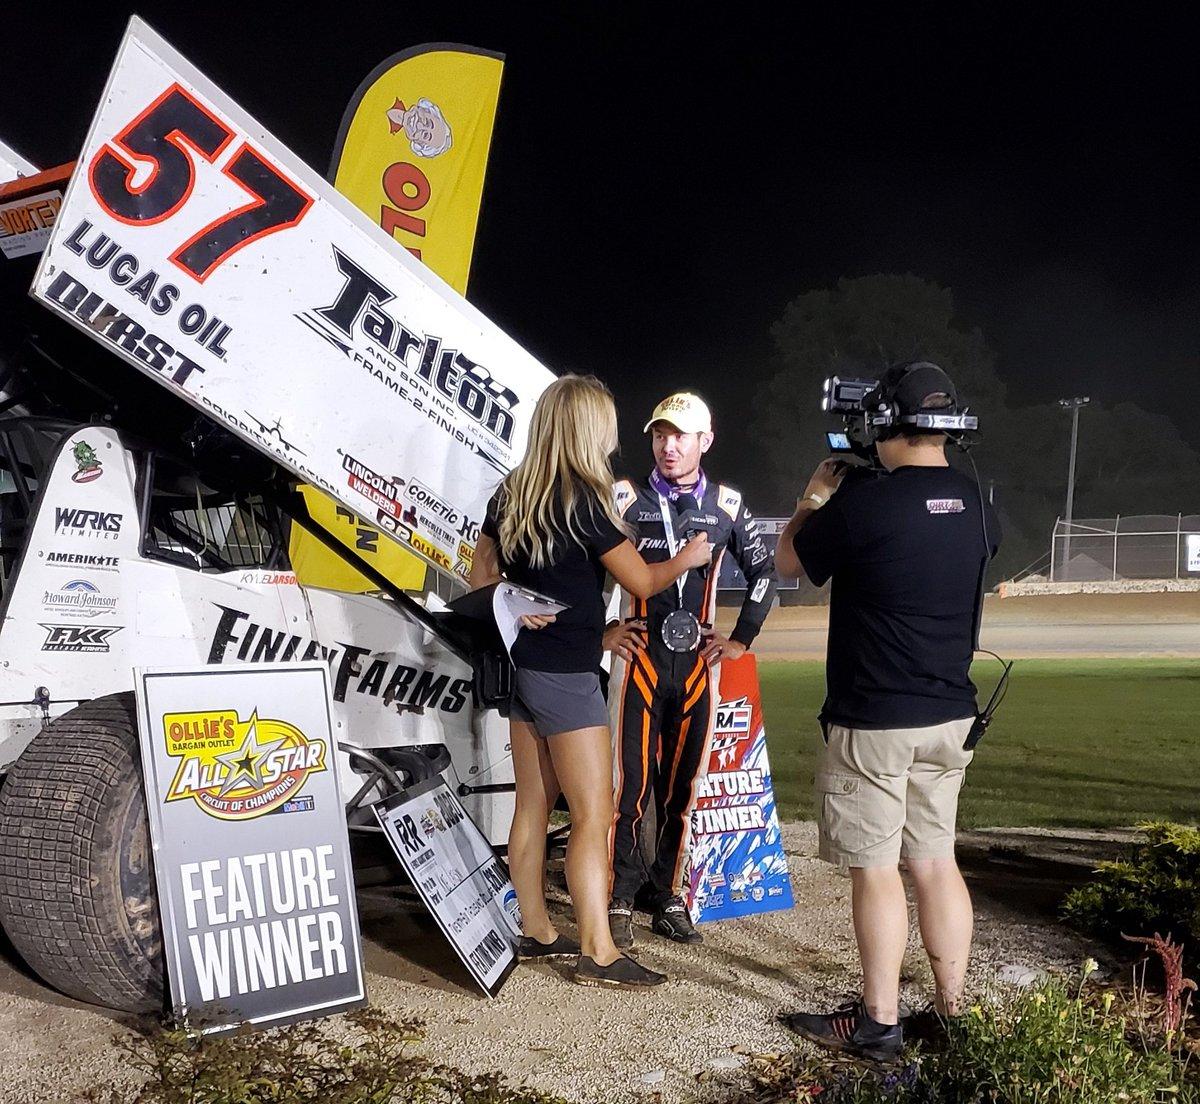 Kyle Larson wins the @RayceRudeenFdn Race worth $26,000 at Plymouth Dirt Track! #OlliesAllStars